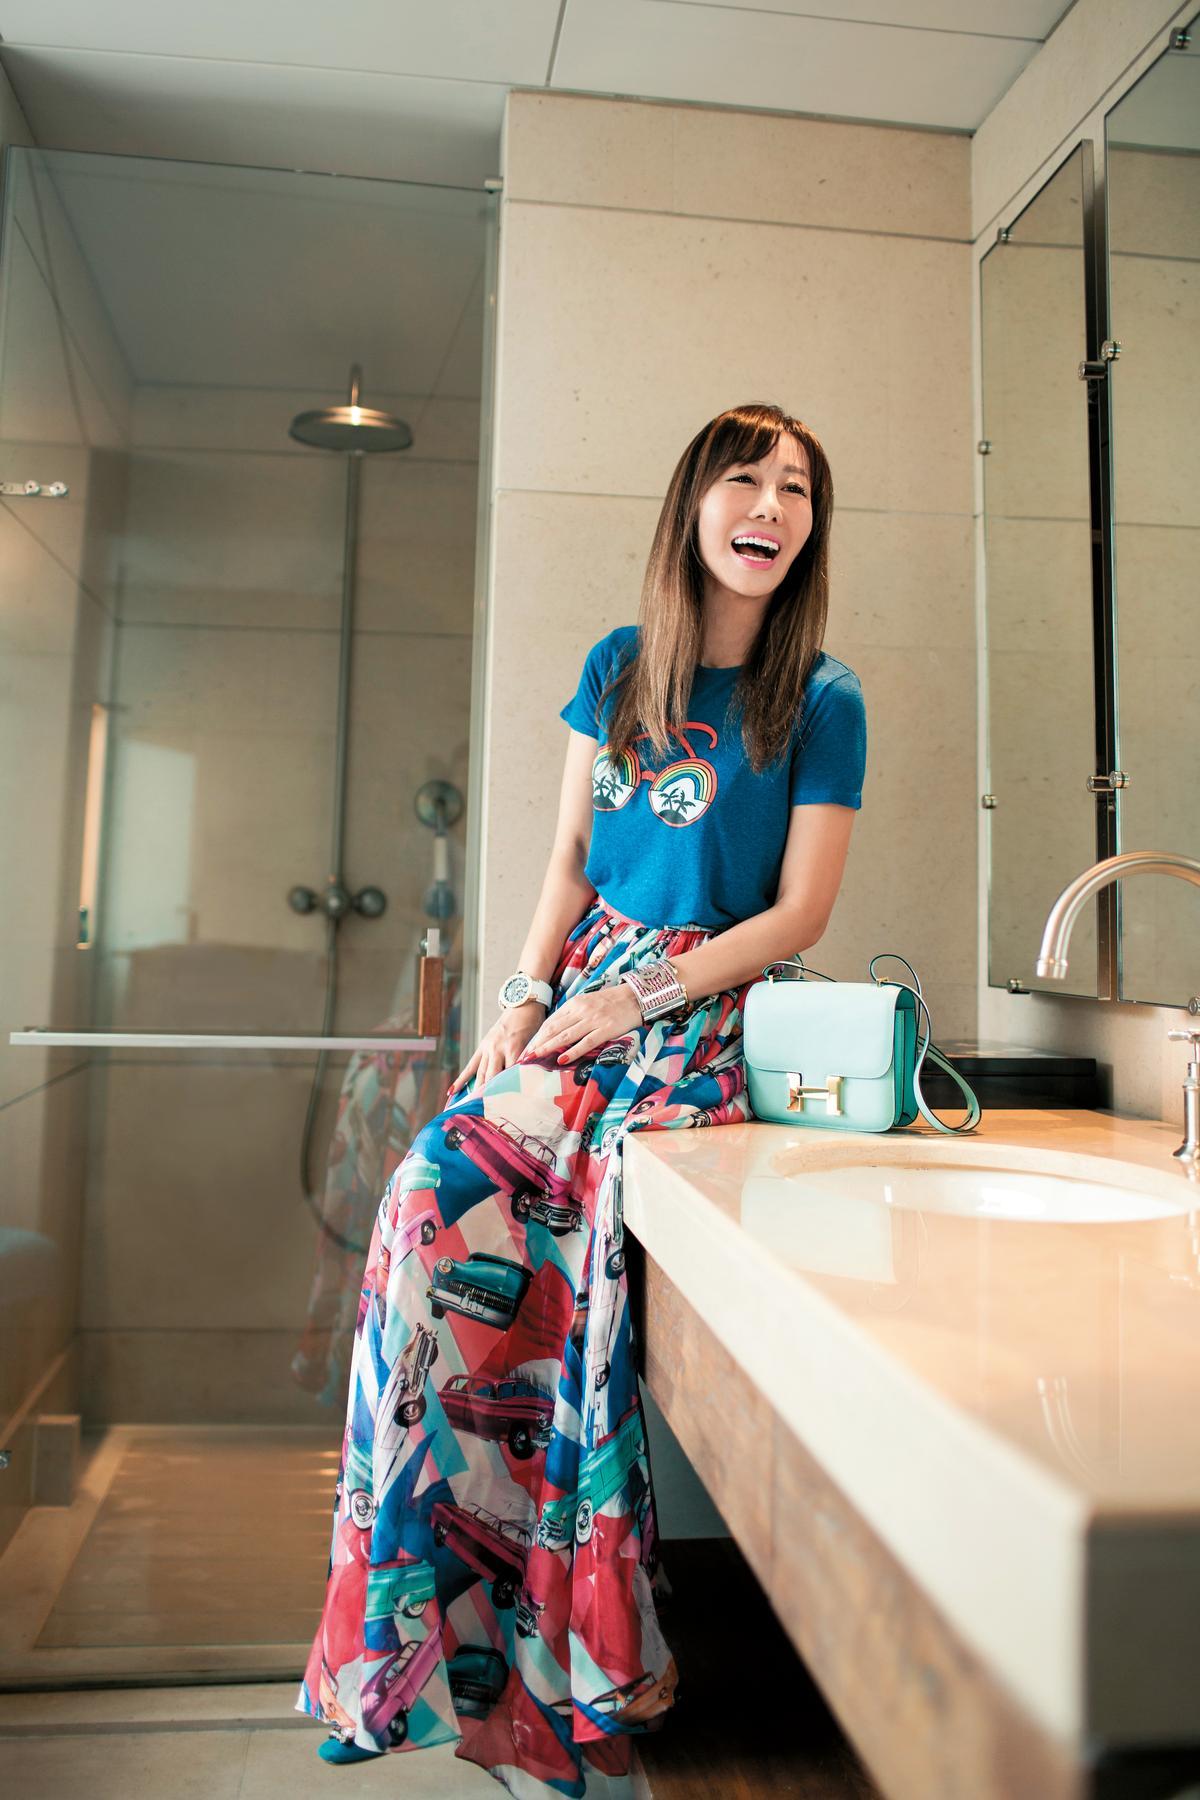 STELLA McCARTNEY藍色童裝T-Shirt。約NT$8,000;CHANEL古巴系列長裙。約NT$120,000;HERMÈS Constance金扣包款。約NT$400,000;miu miu平底鞋。約NT$28,000